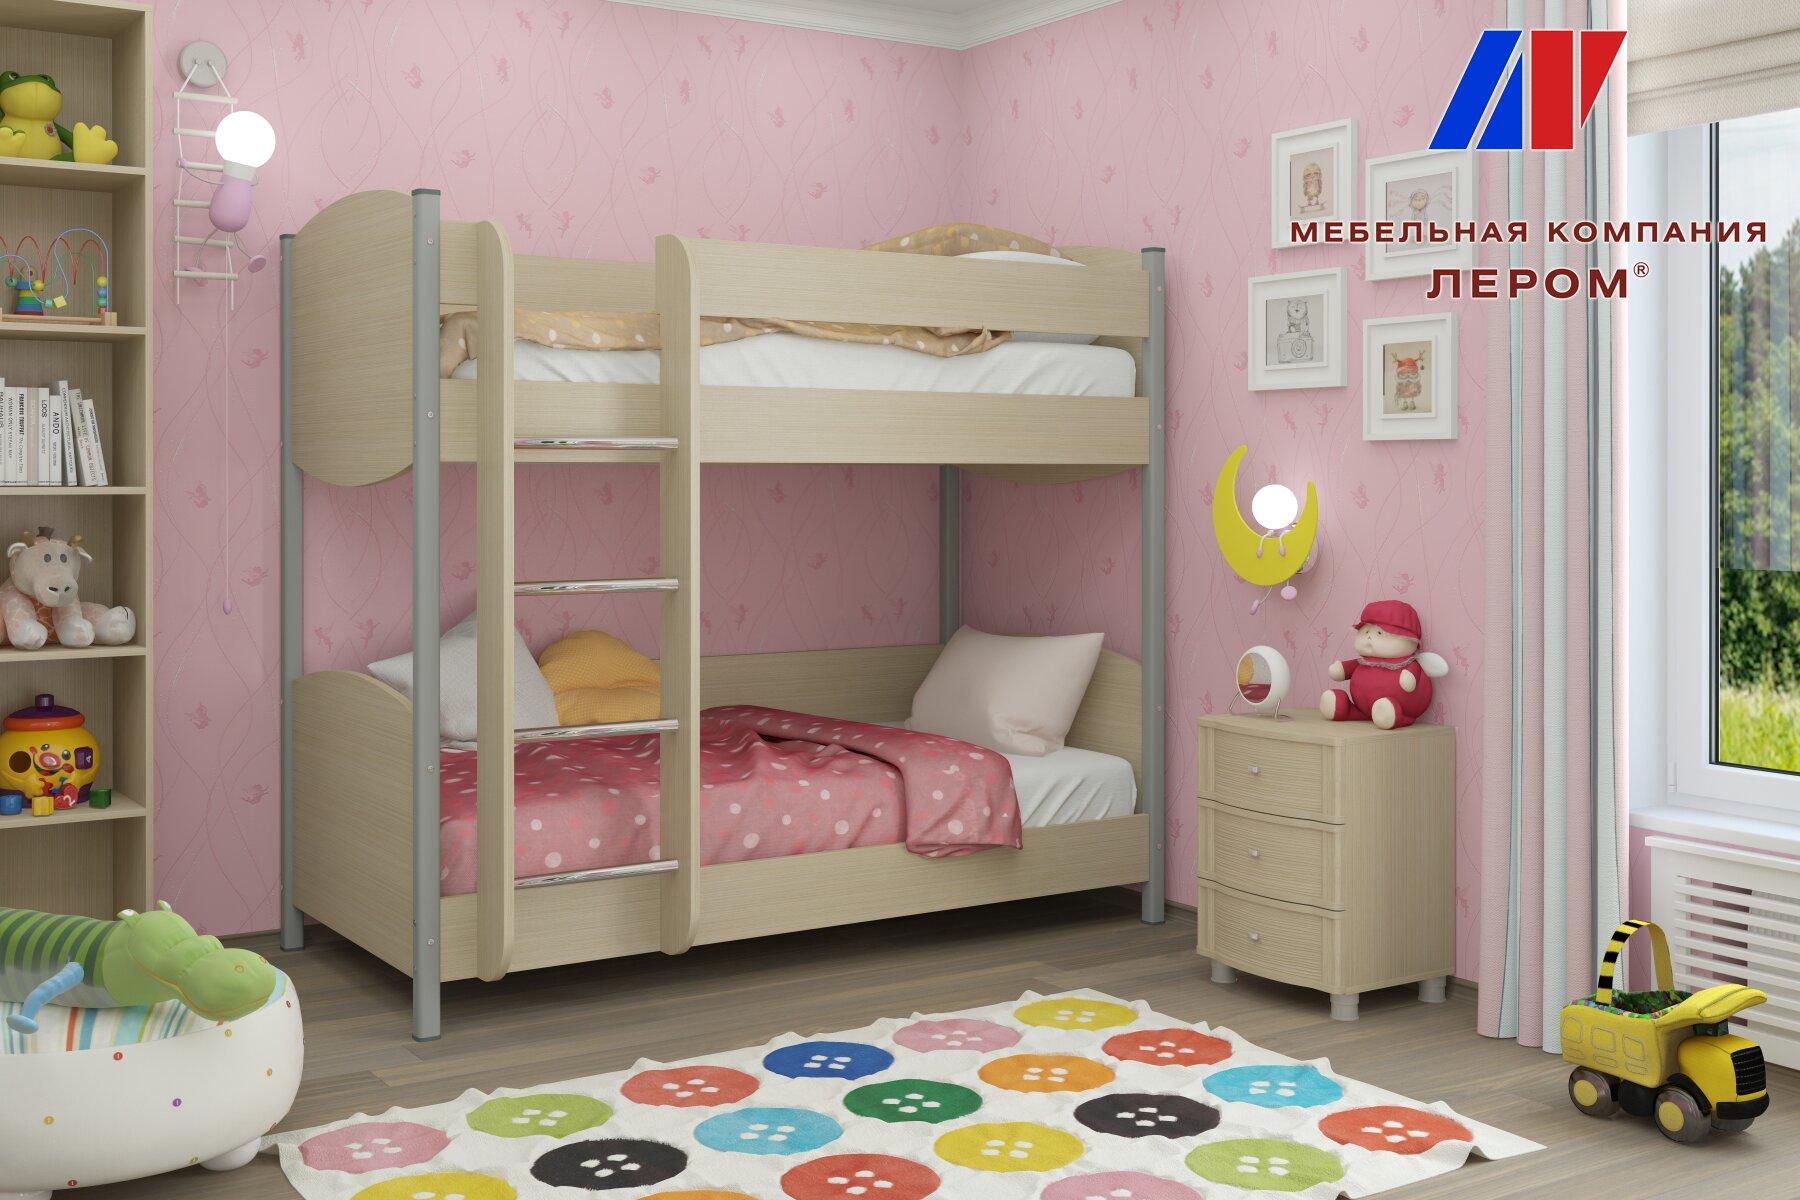 Двухъяруснвая кровать КР-123 (90х190) (дуб беленый)